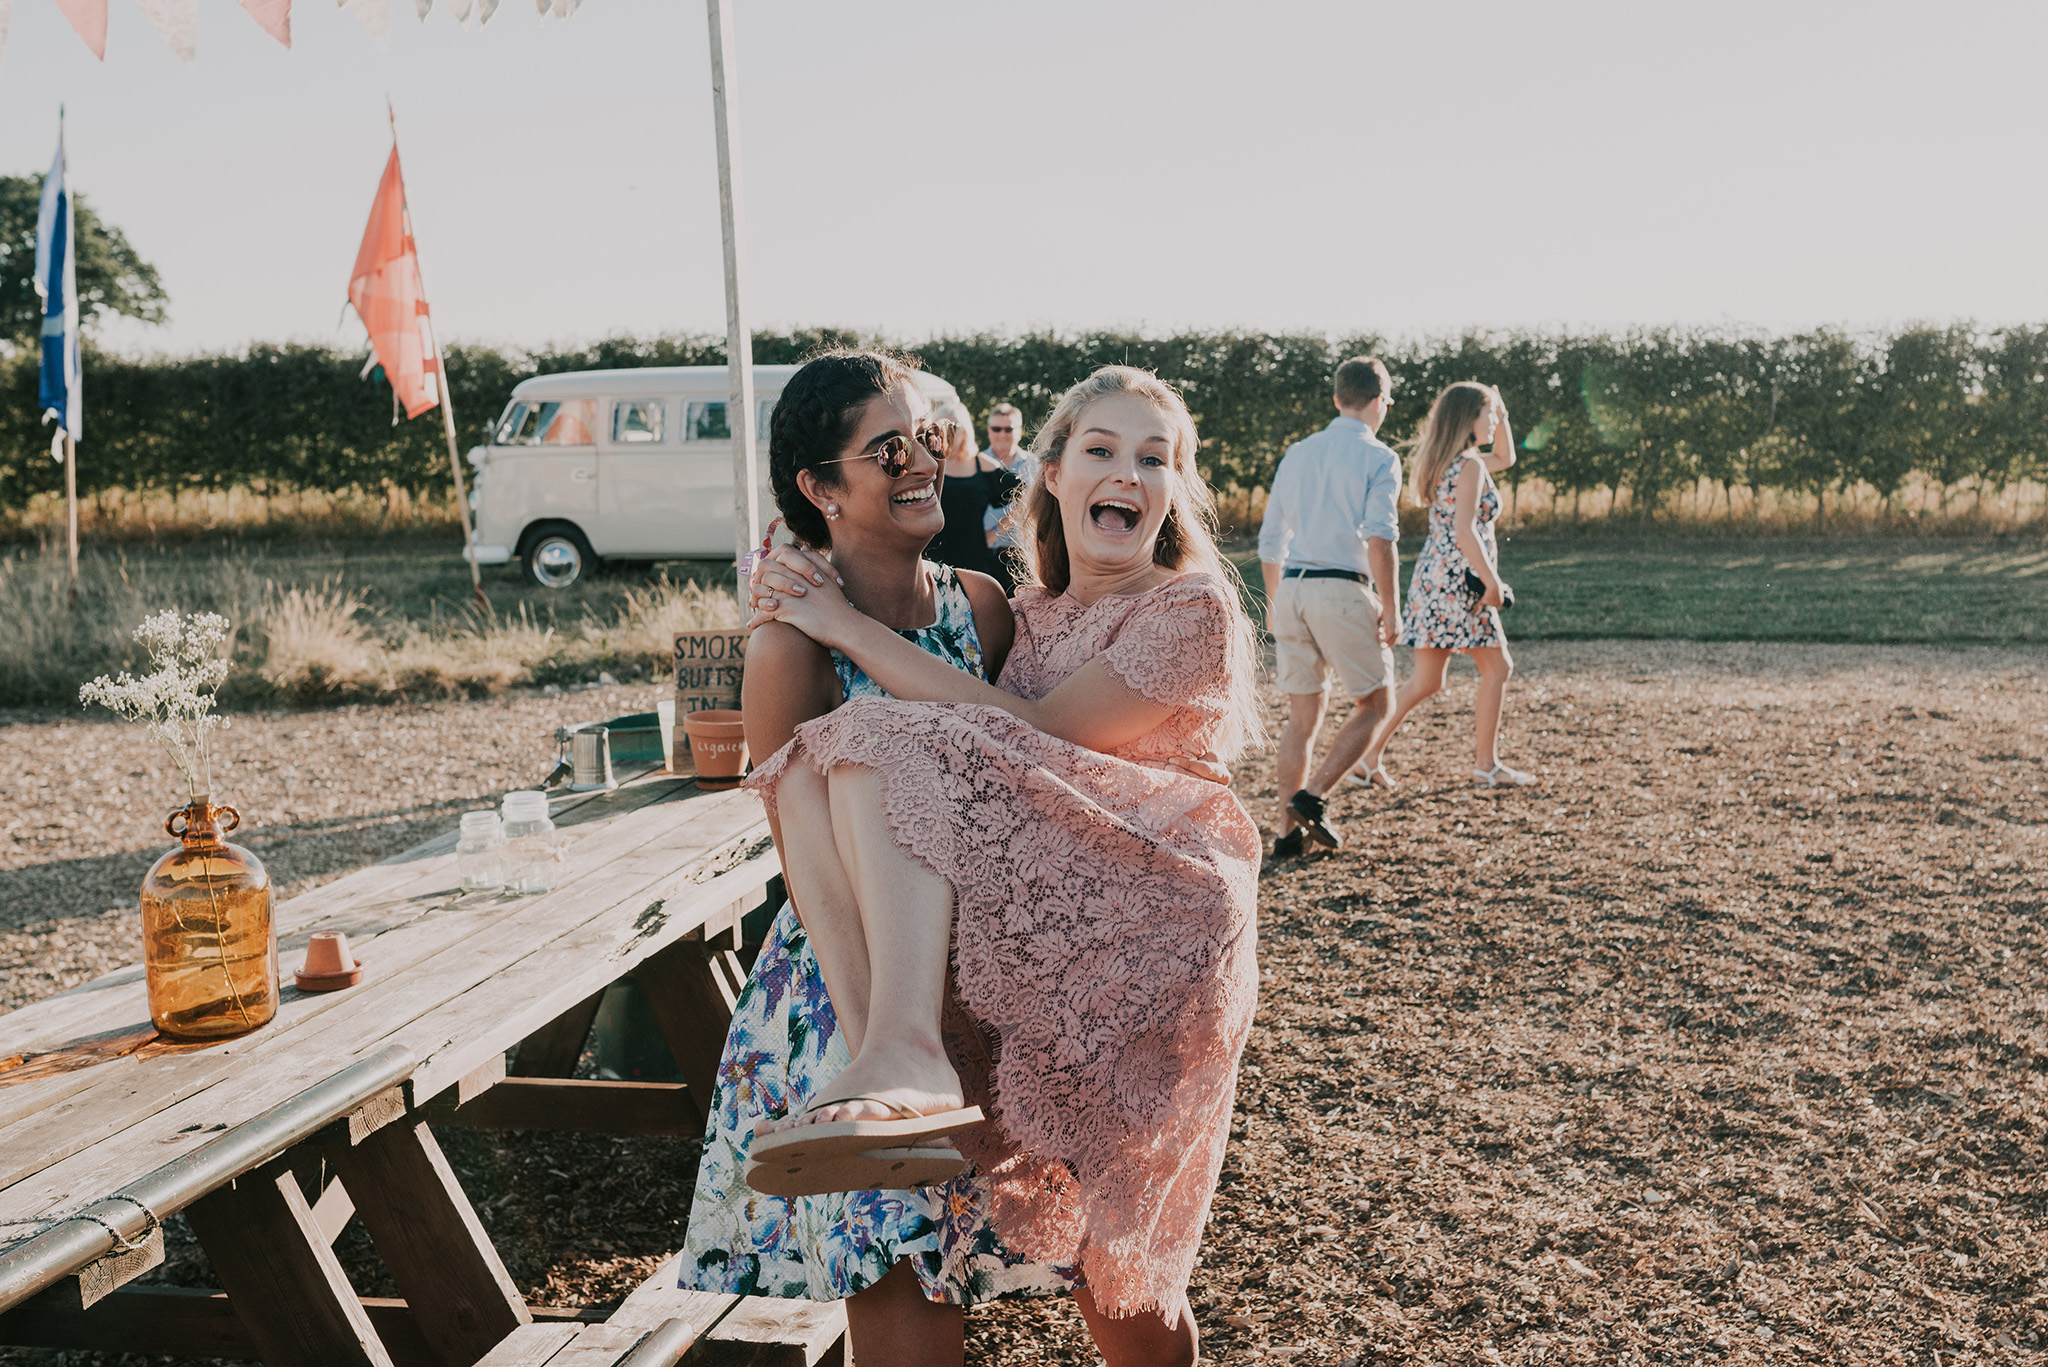 scott-stockwell-photography-wedding-30.jpg